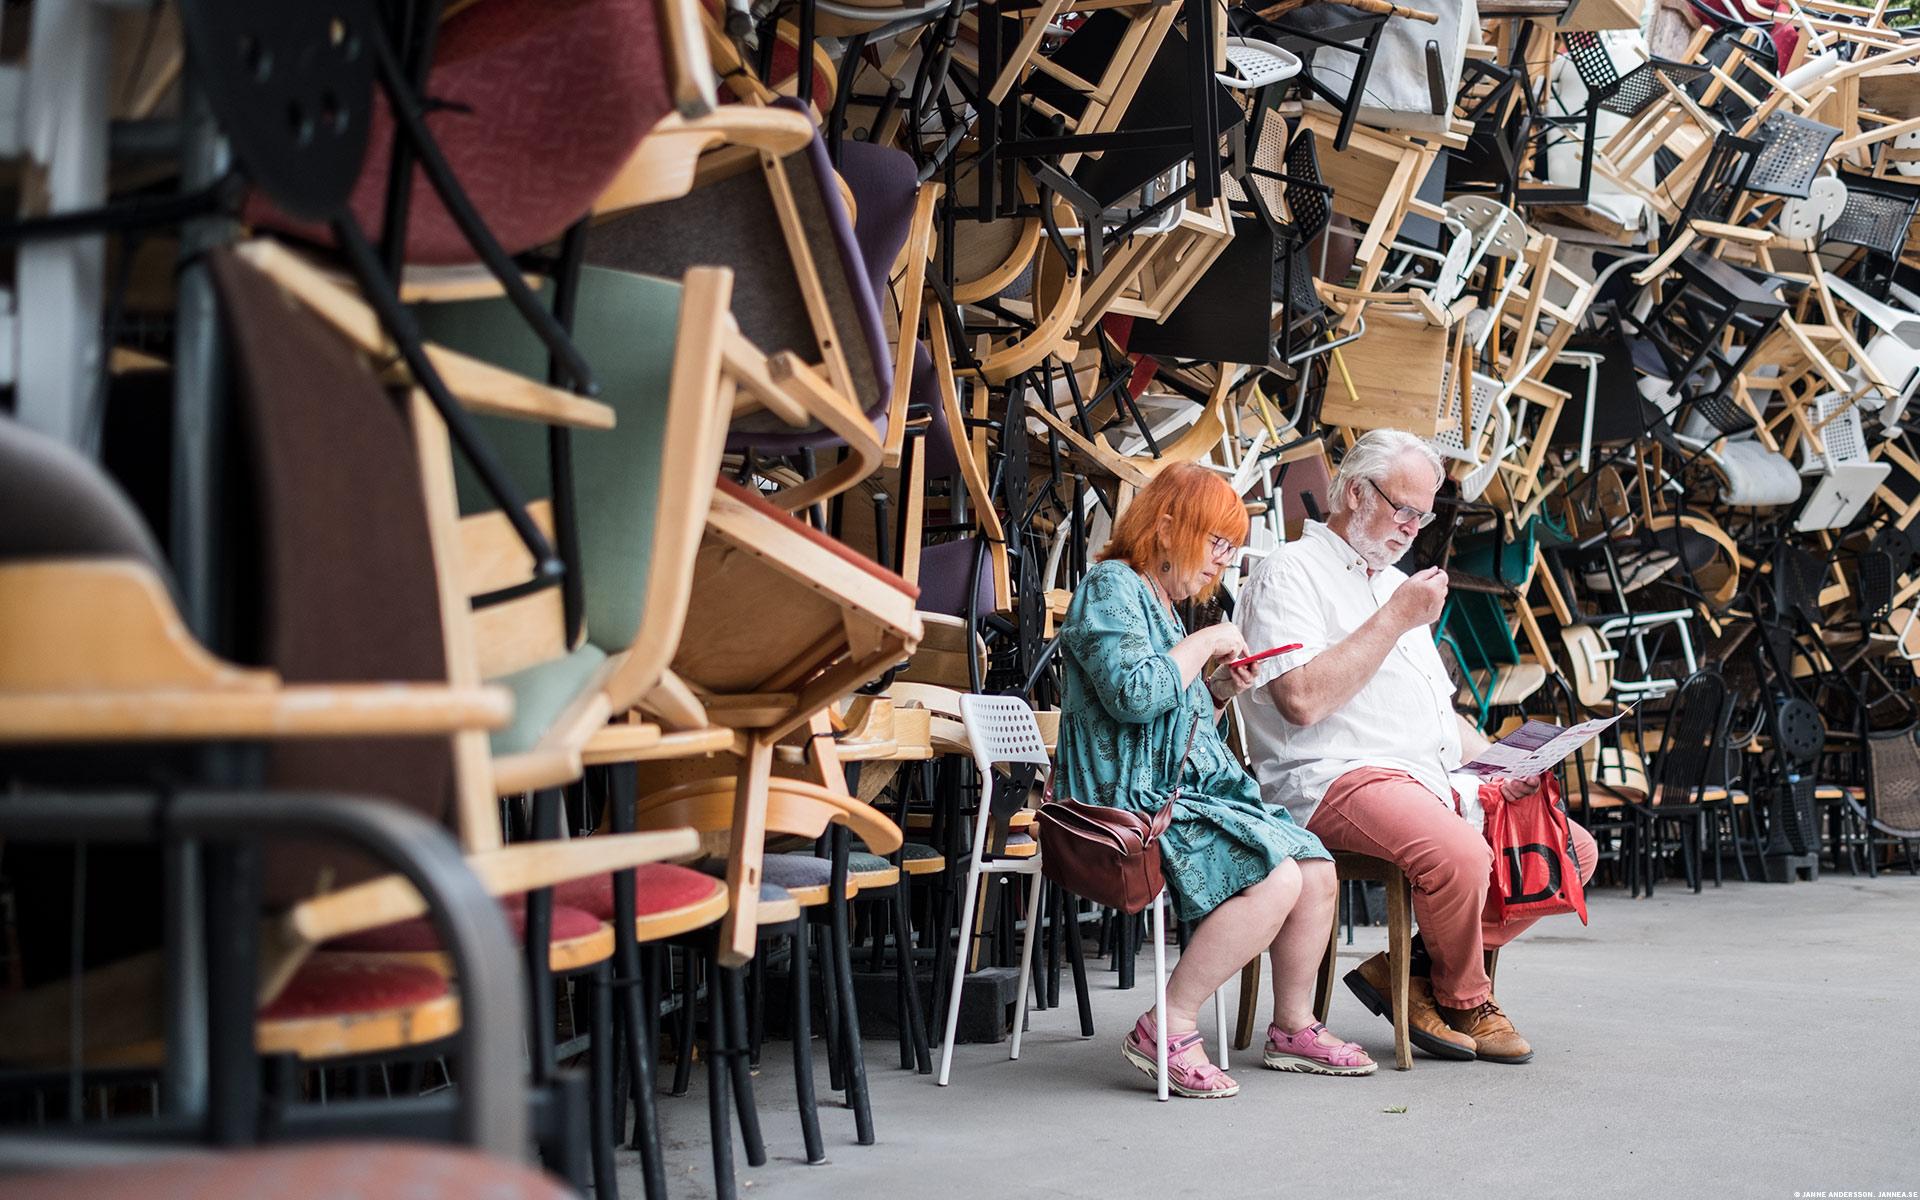 Open Art 2017 i Örebro |© Janne A